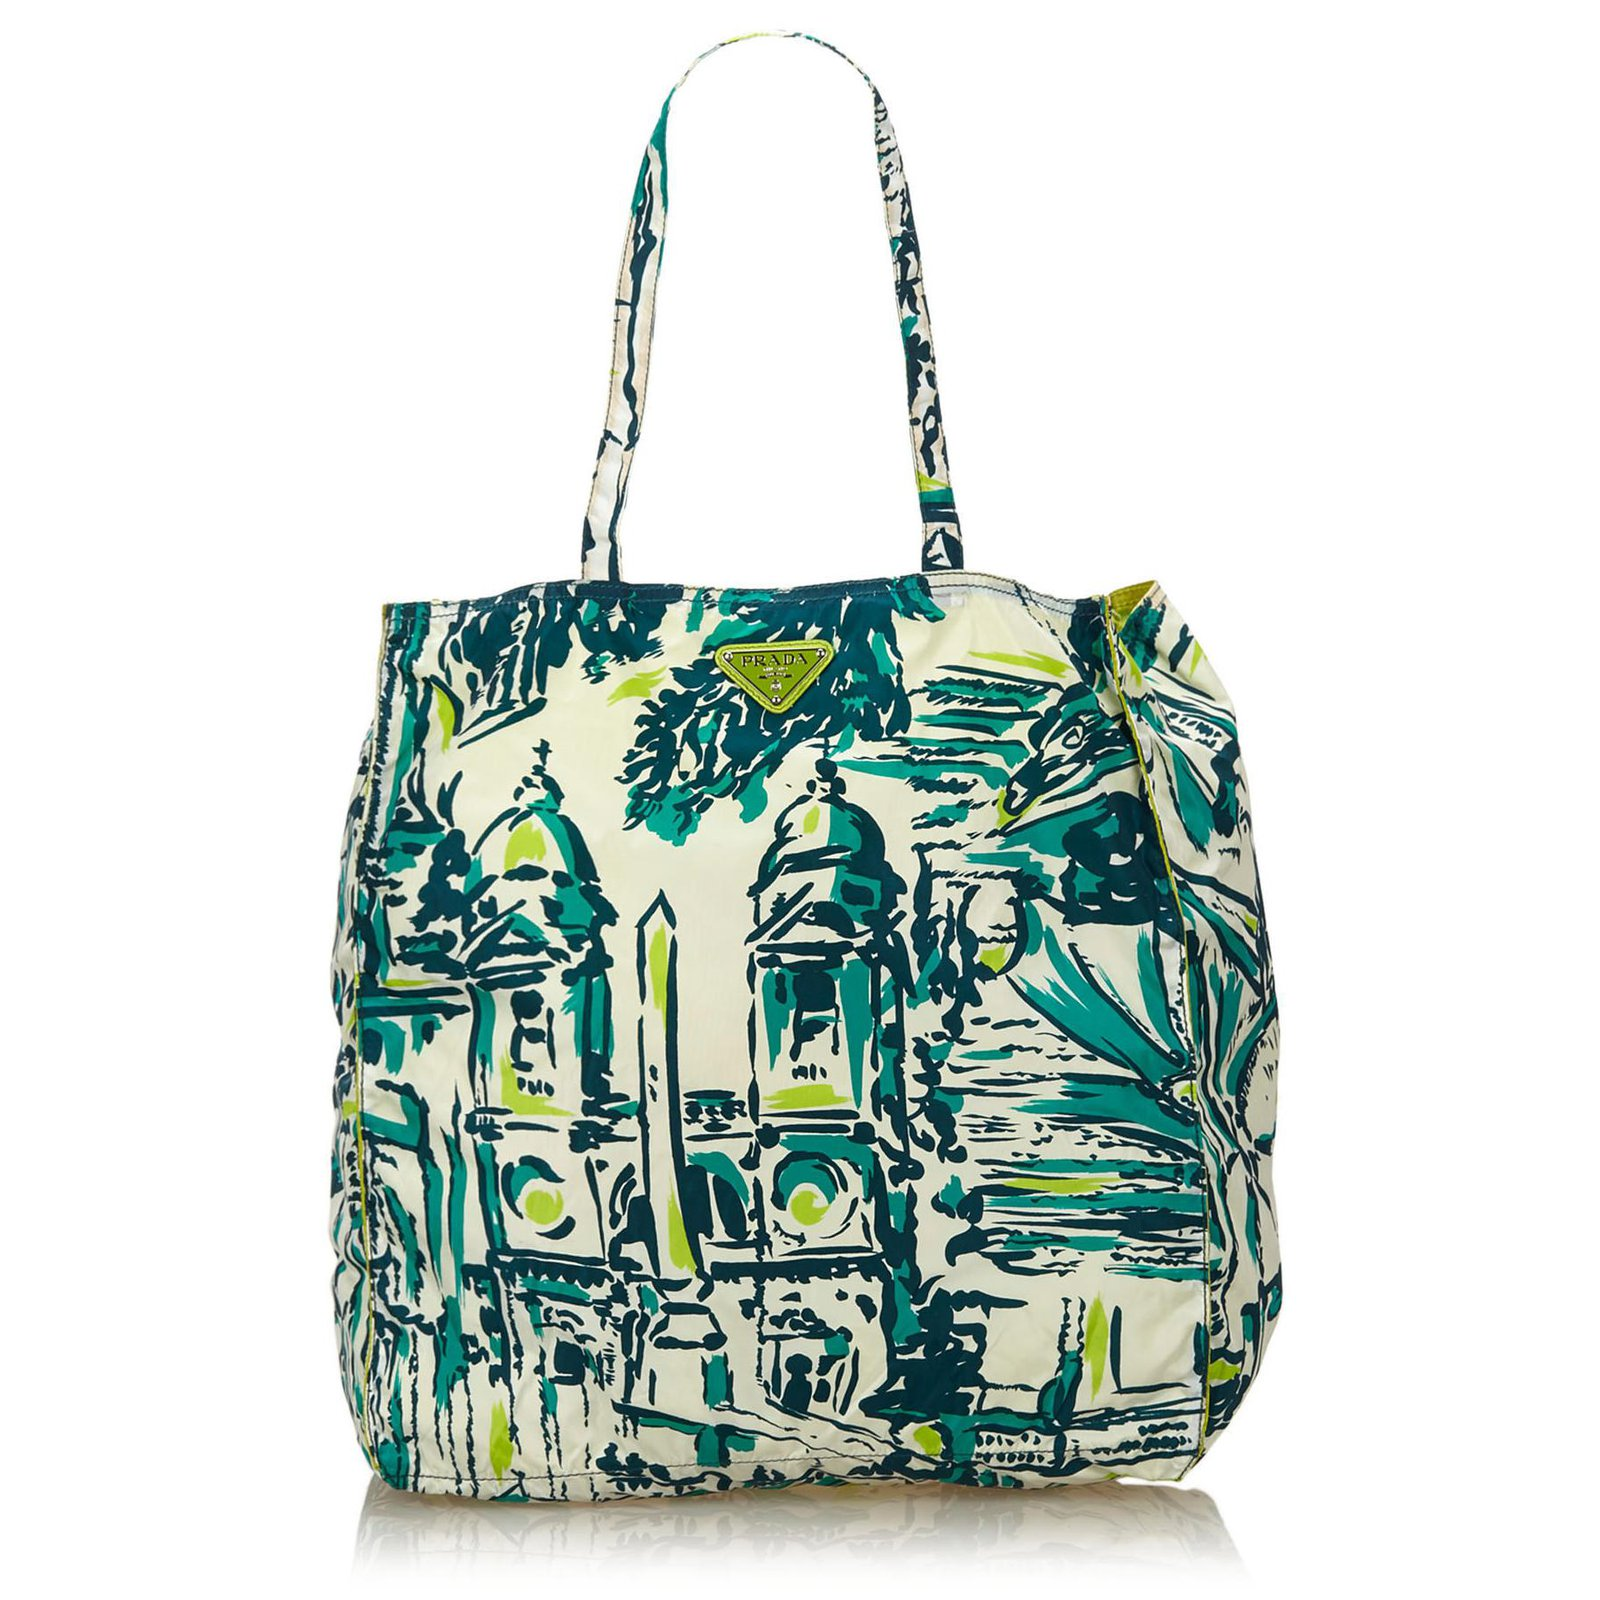 1d53b613b2ac Prada Printed Nylon Tote Bag Totes Nylon,Cloth Multiple colors,Green  ref.82797